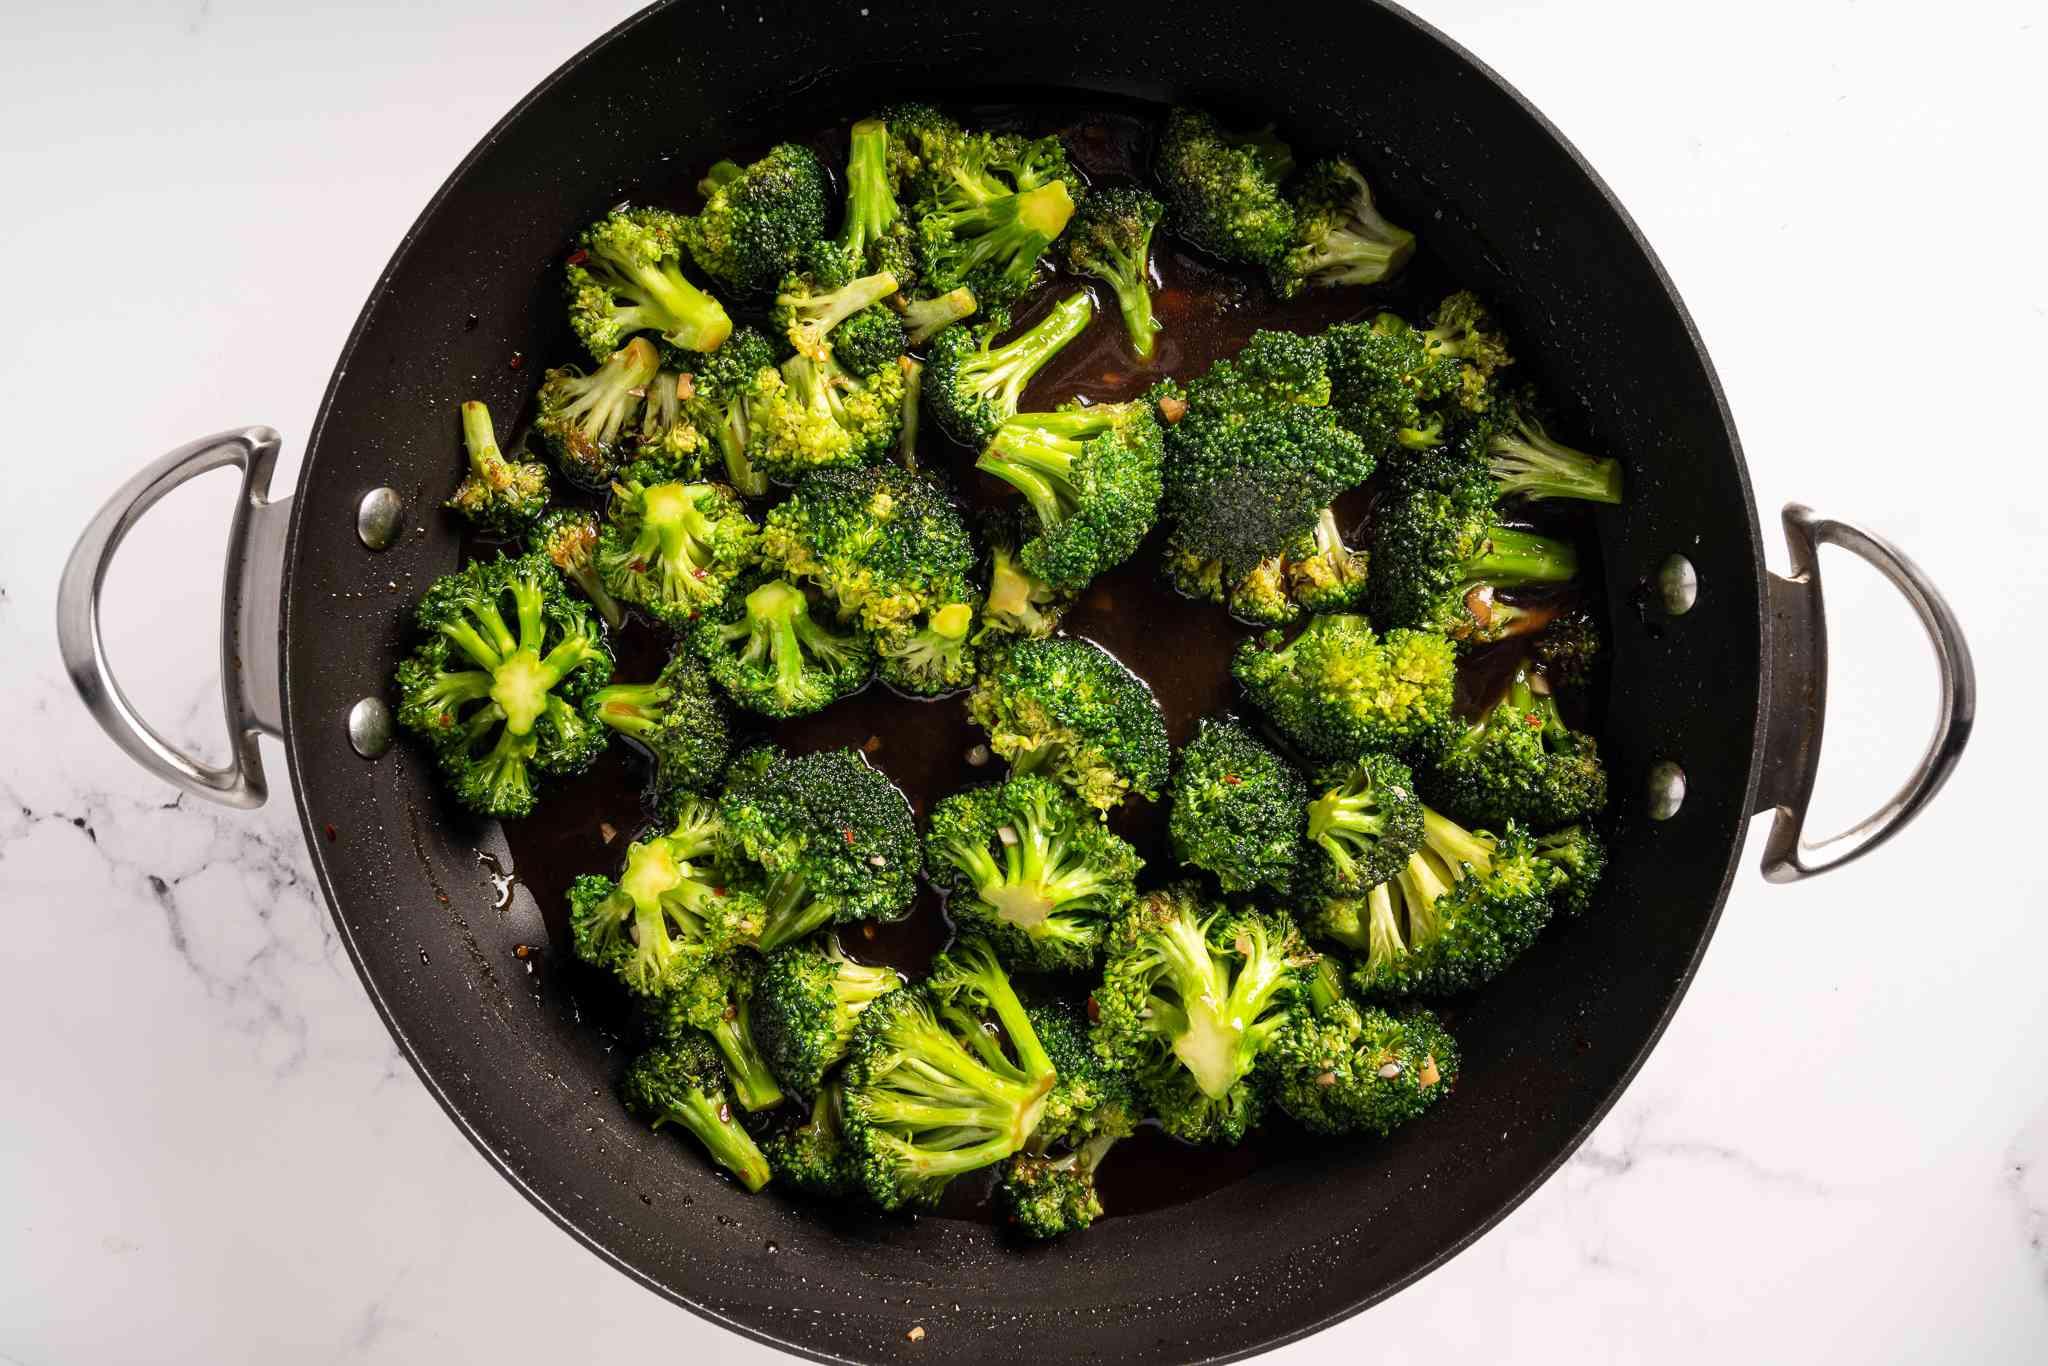 Vegan Broccoli With Garlic Sauce in a pan